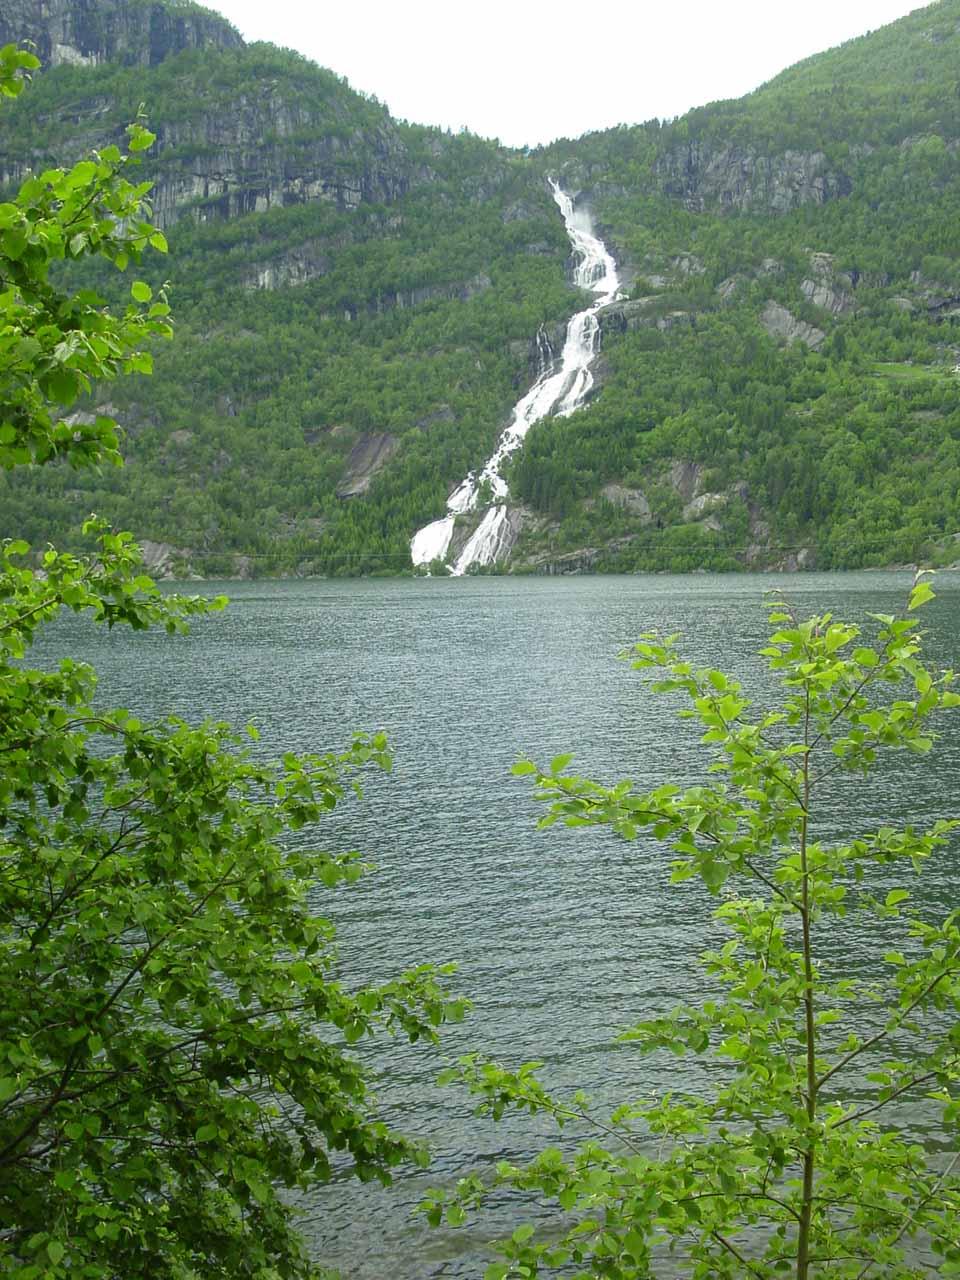 Looking through an opening in the foliage across Sandvinvatnet towards Strondsfossen